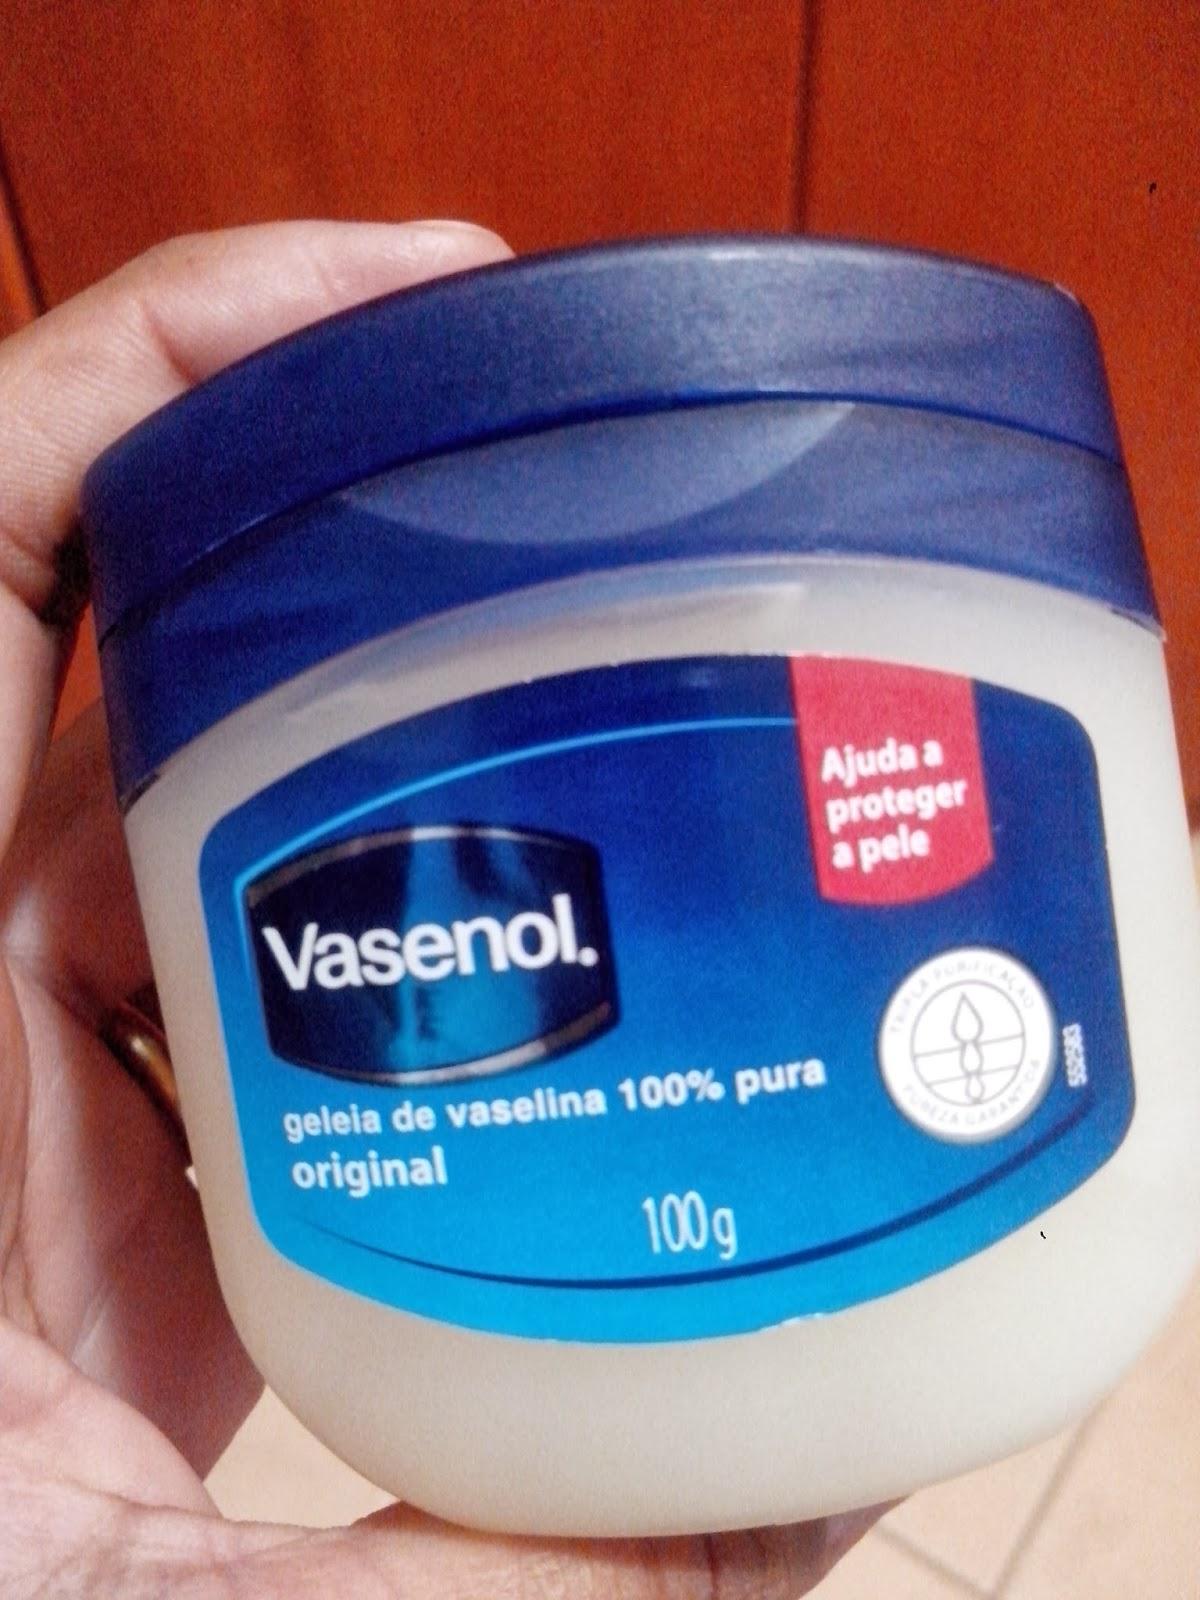 Vasenol Geléia de Vaselina Original Resenha